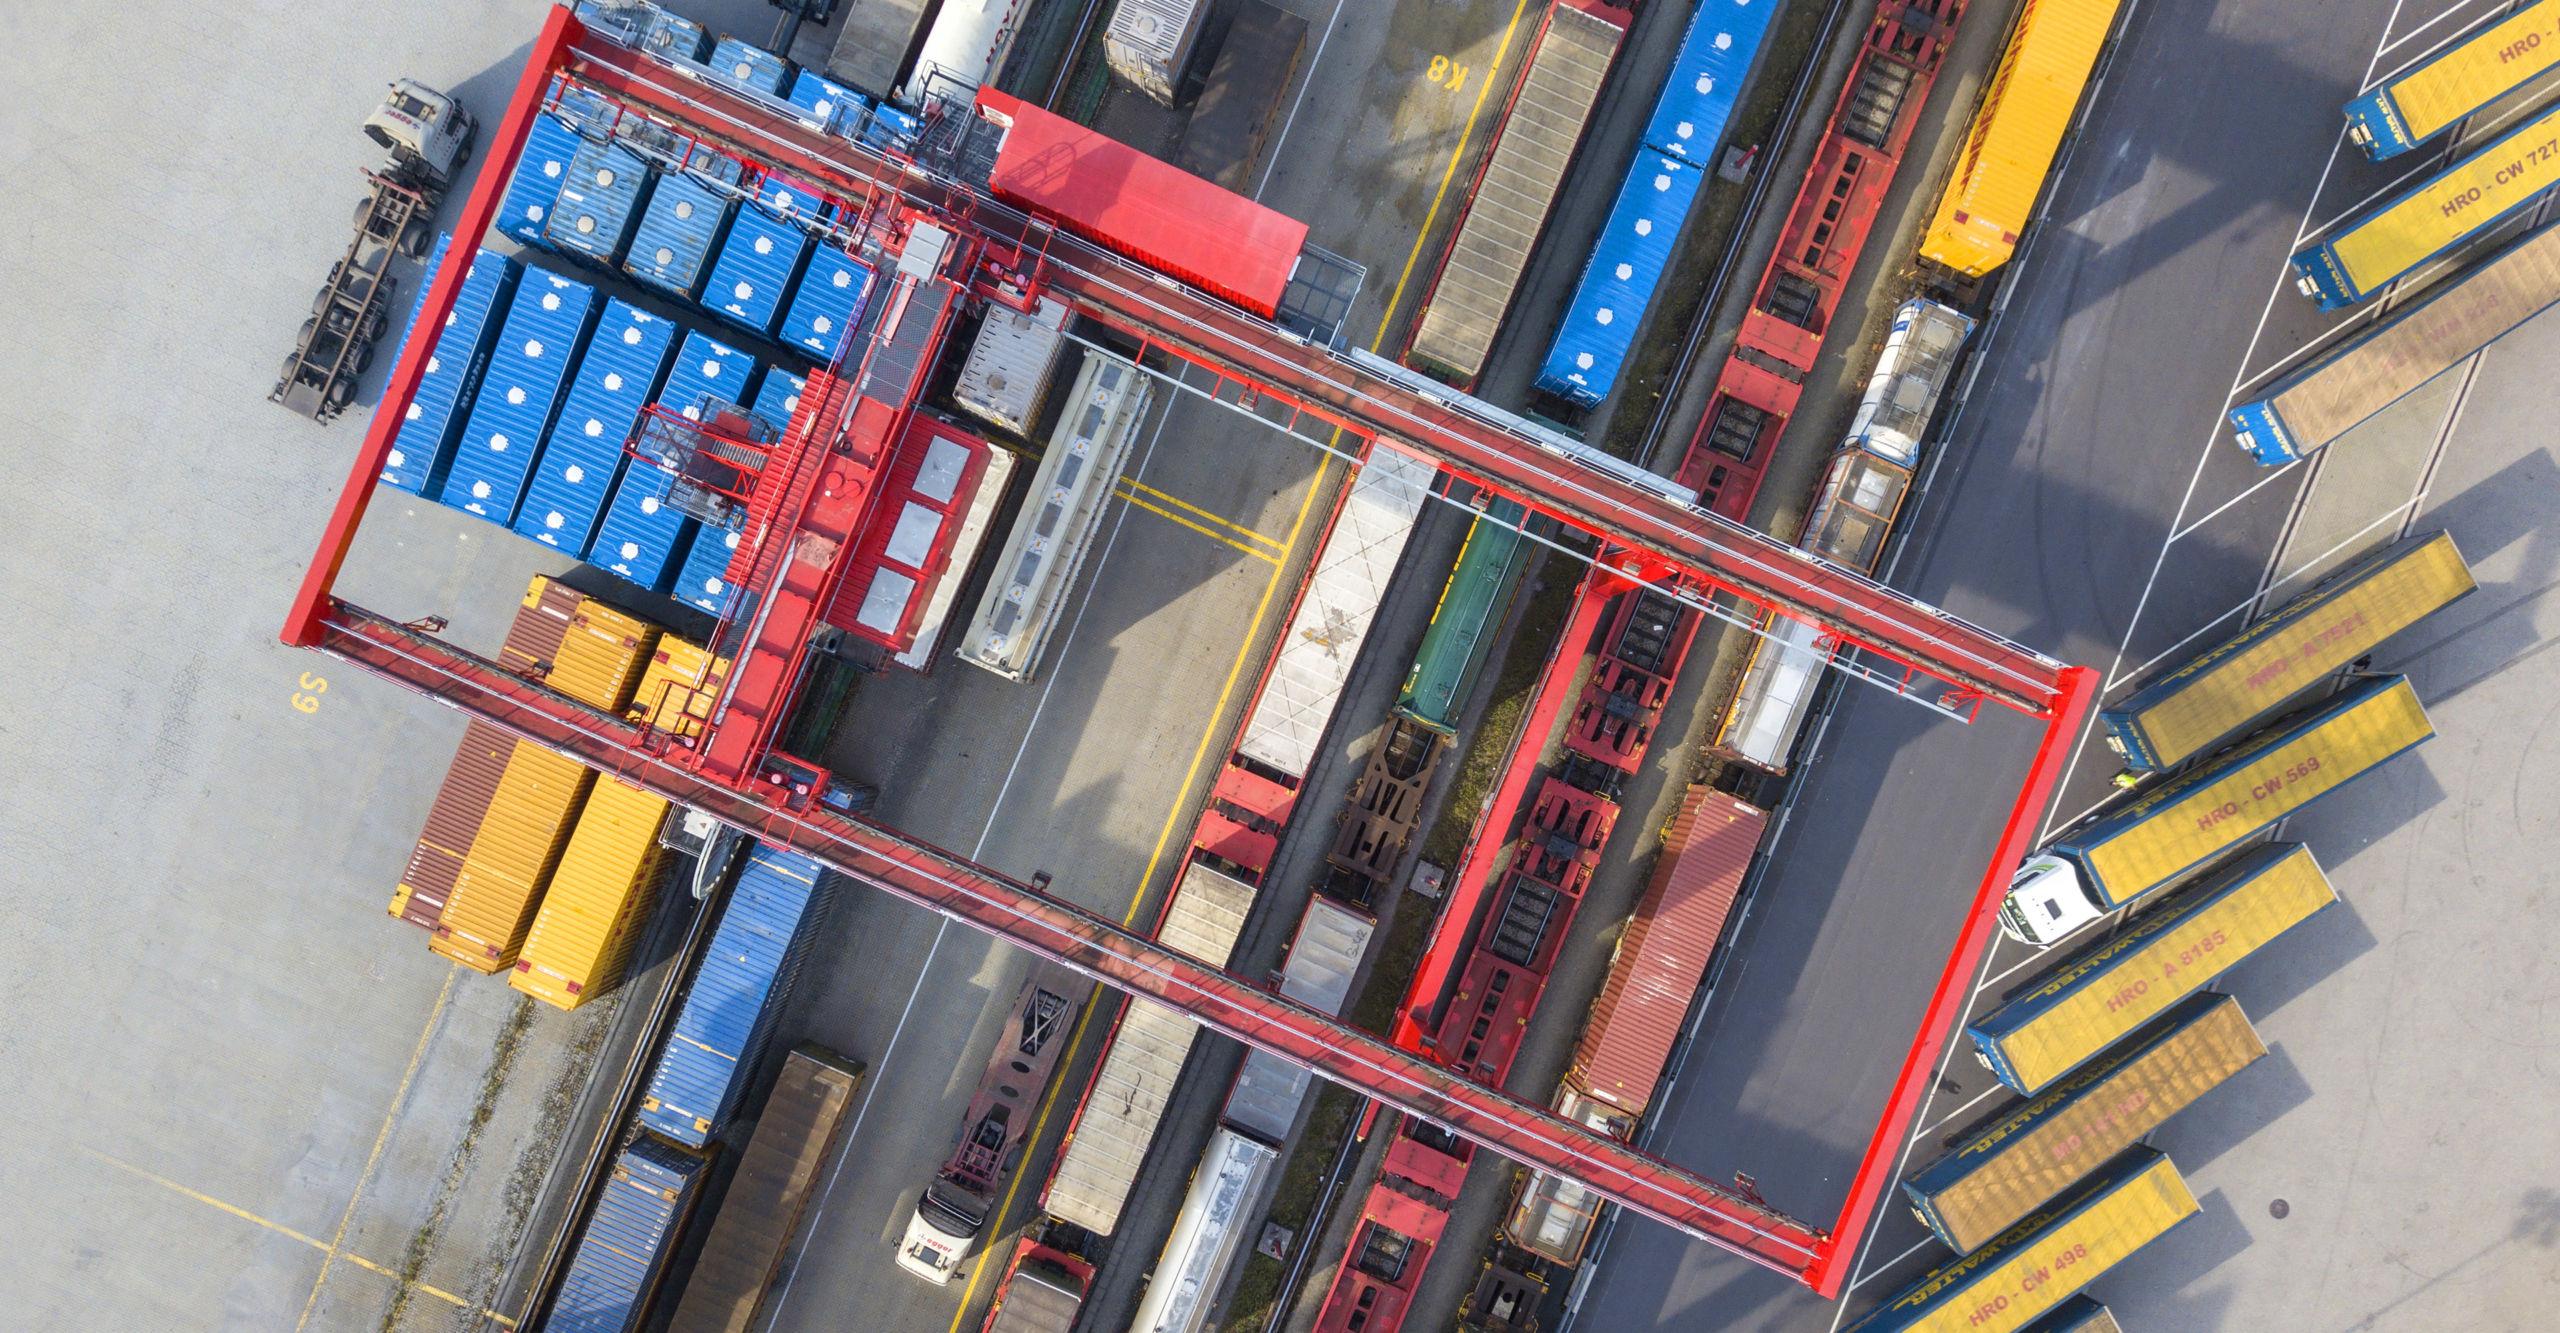 Vaxtor Logistics solutions